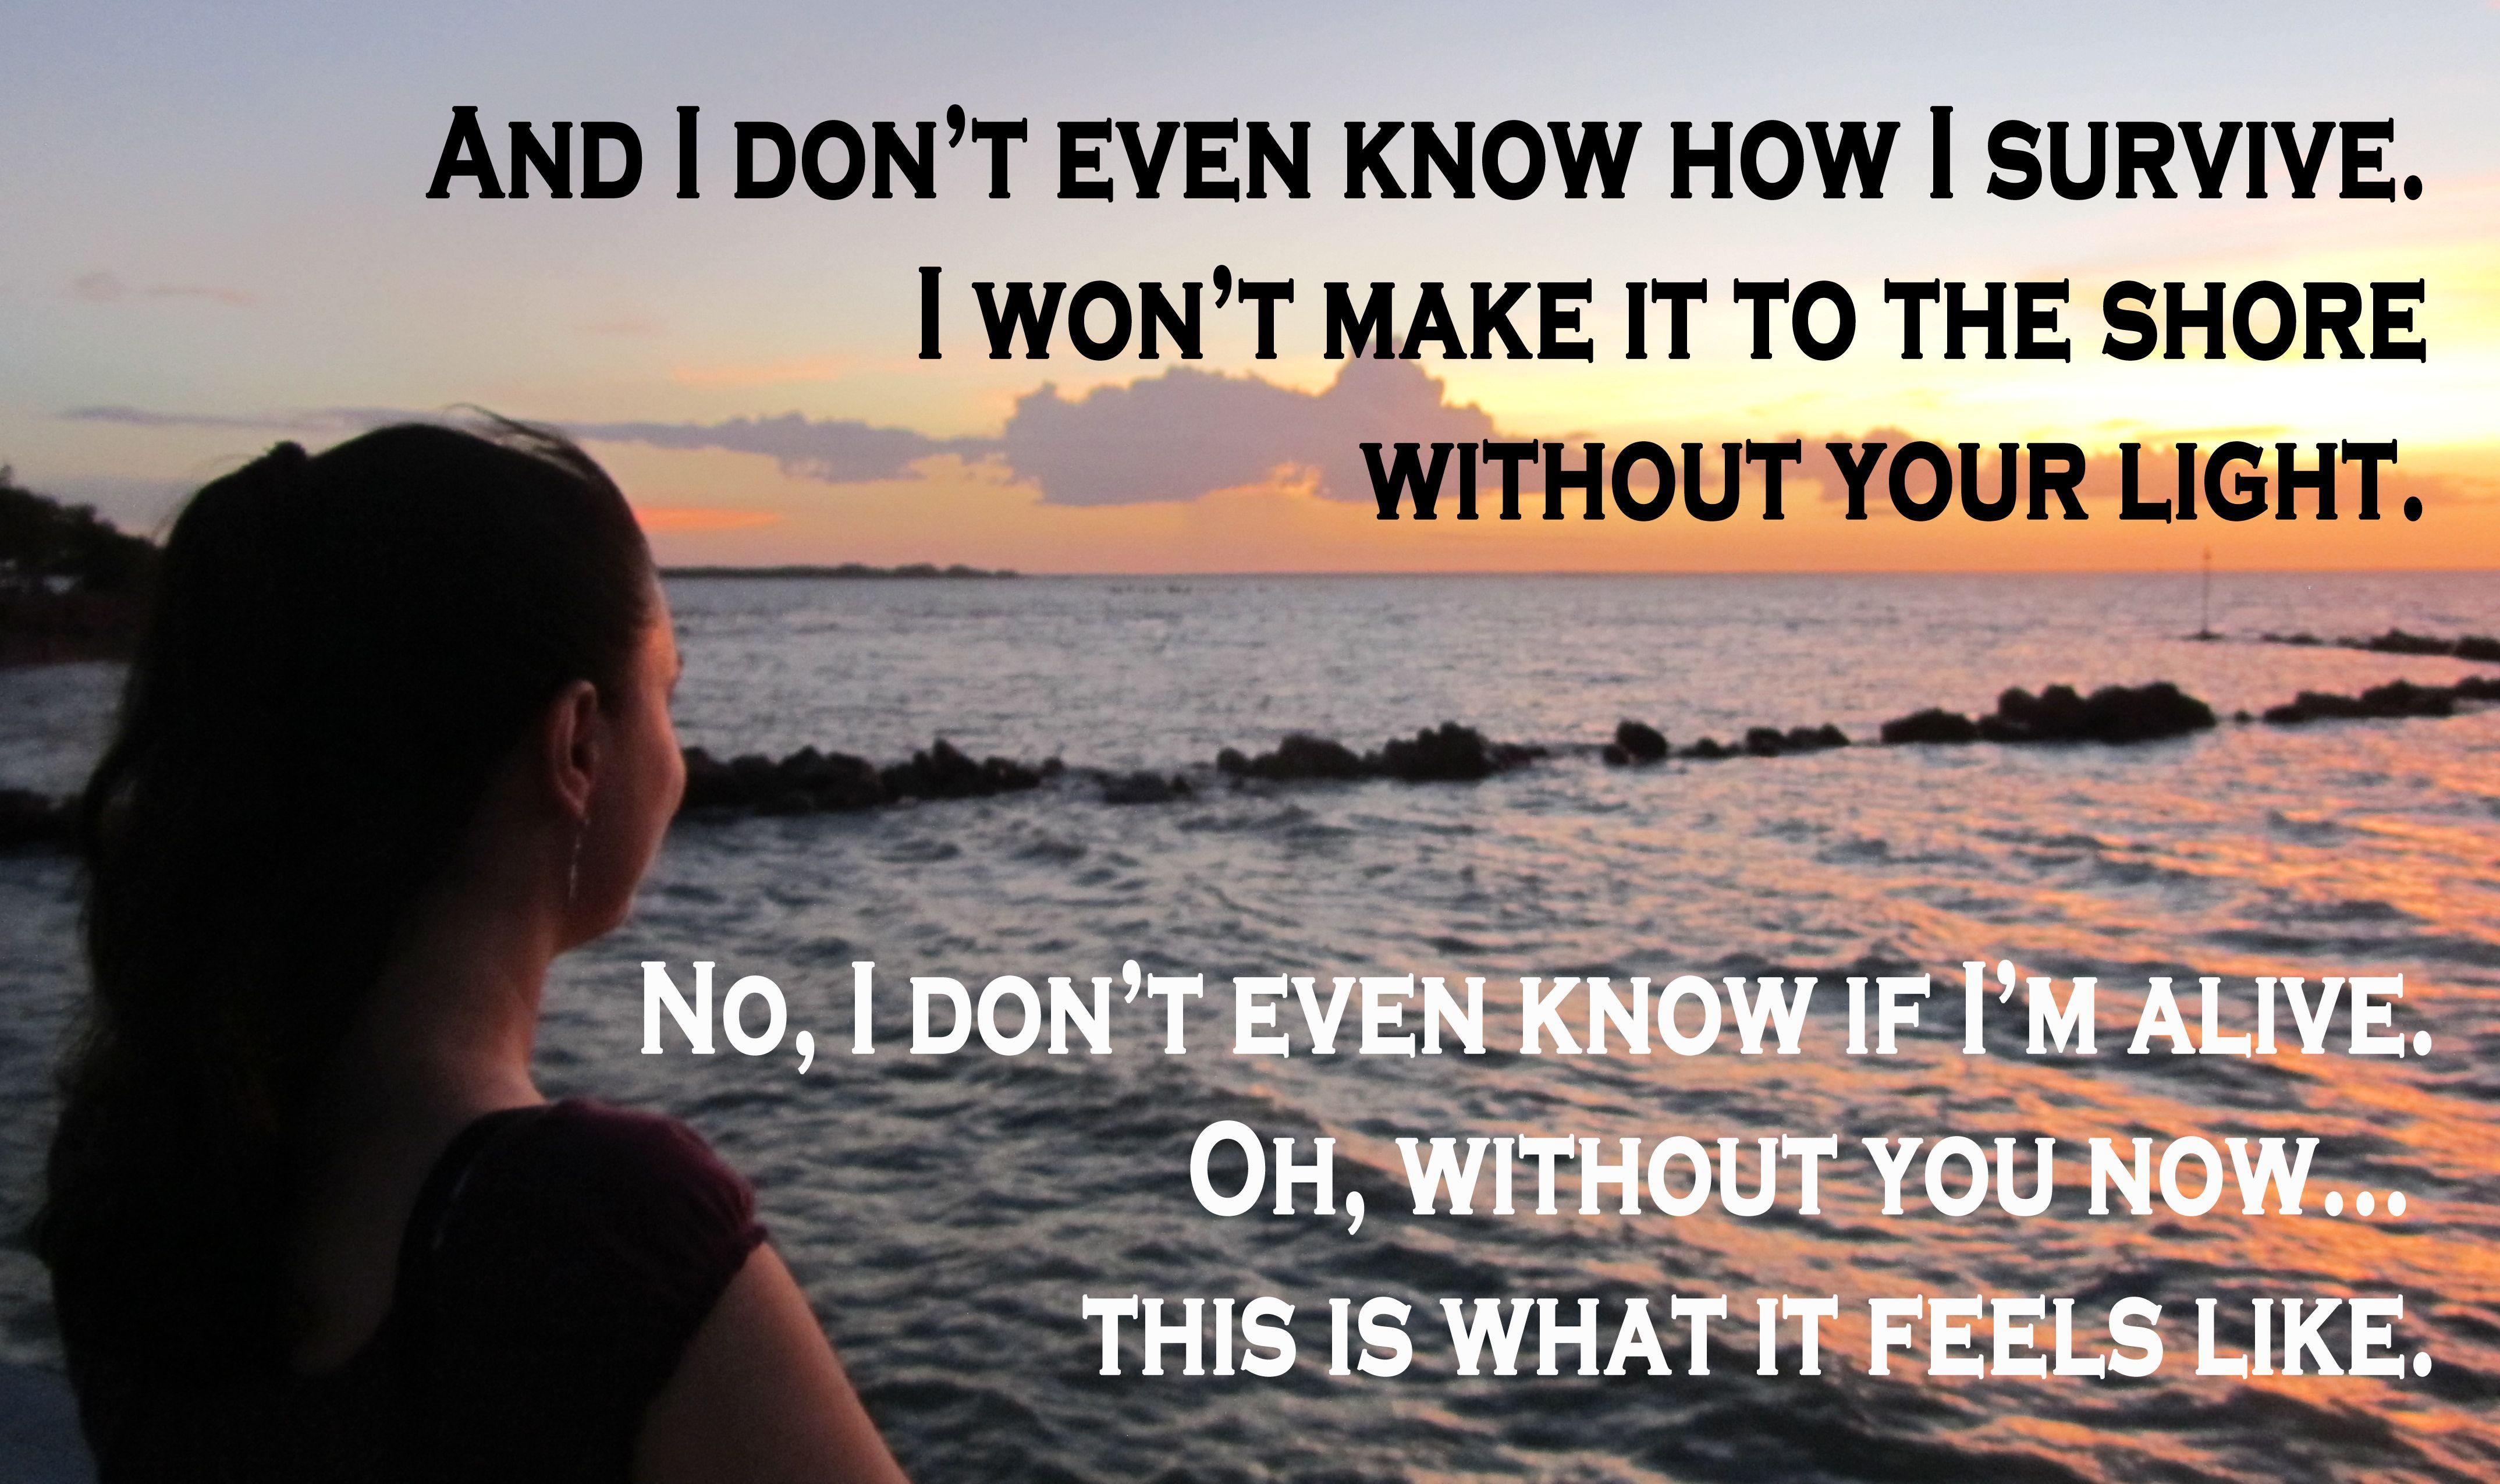 Pin by Seattle EDM on Lyrics | Lyric quotes, Lyrics, Cool lyrics